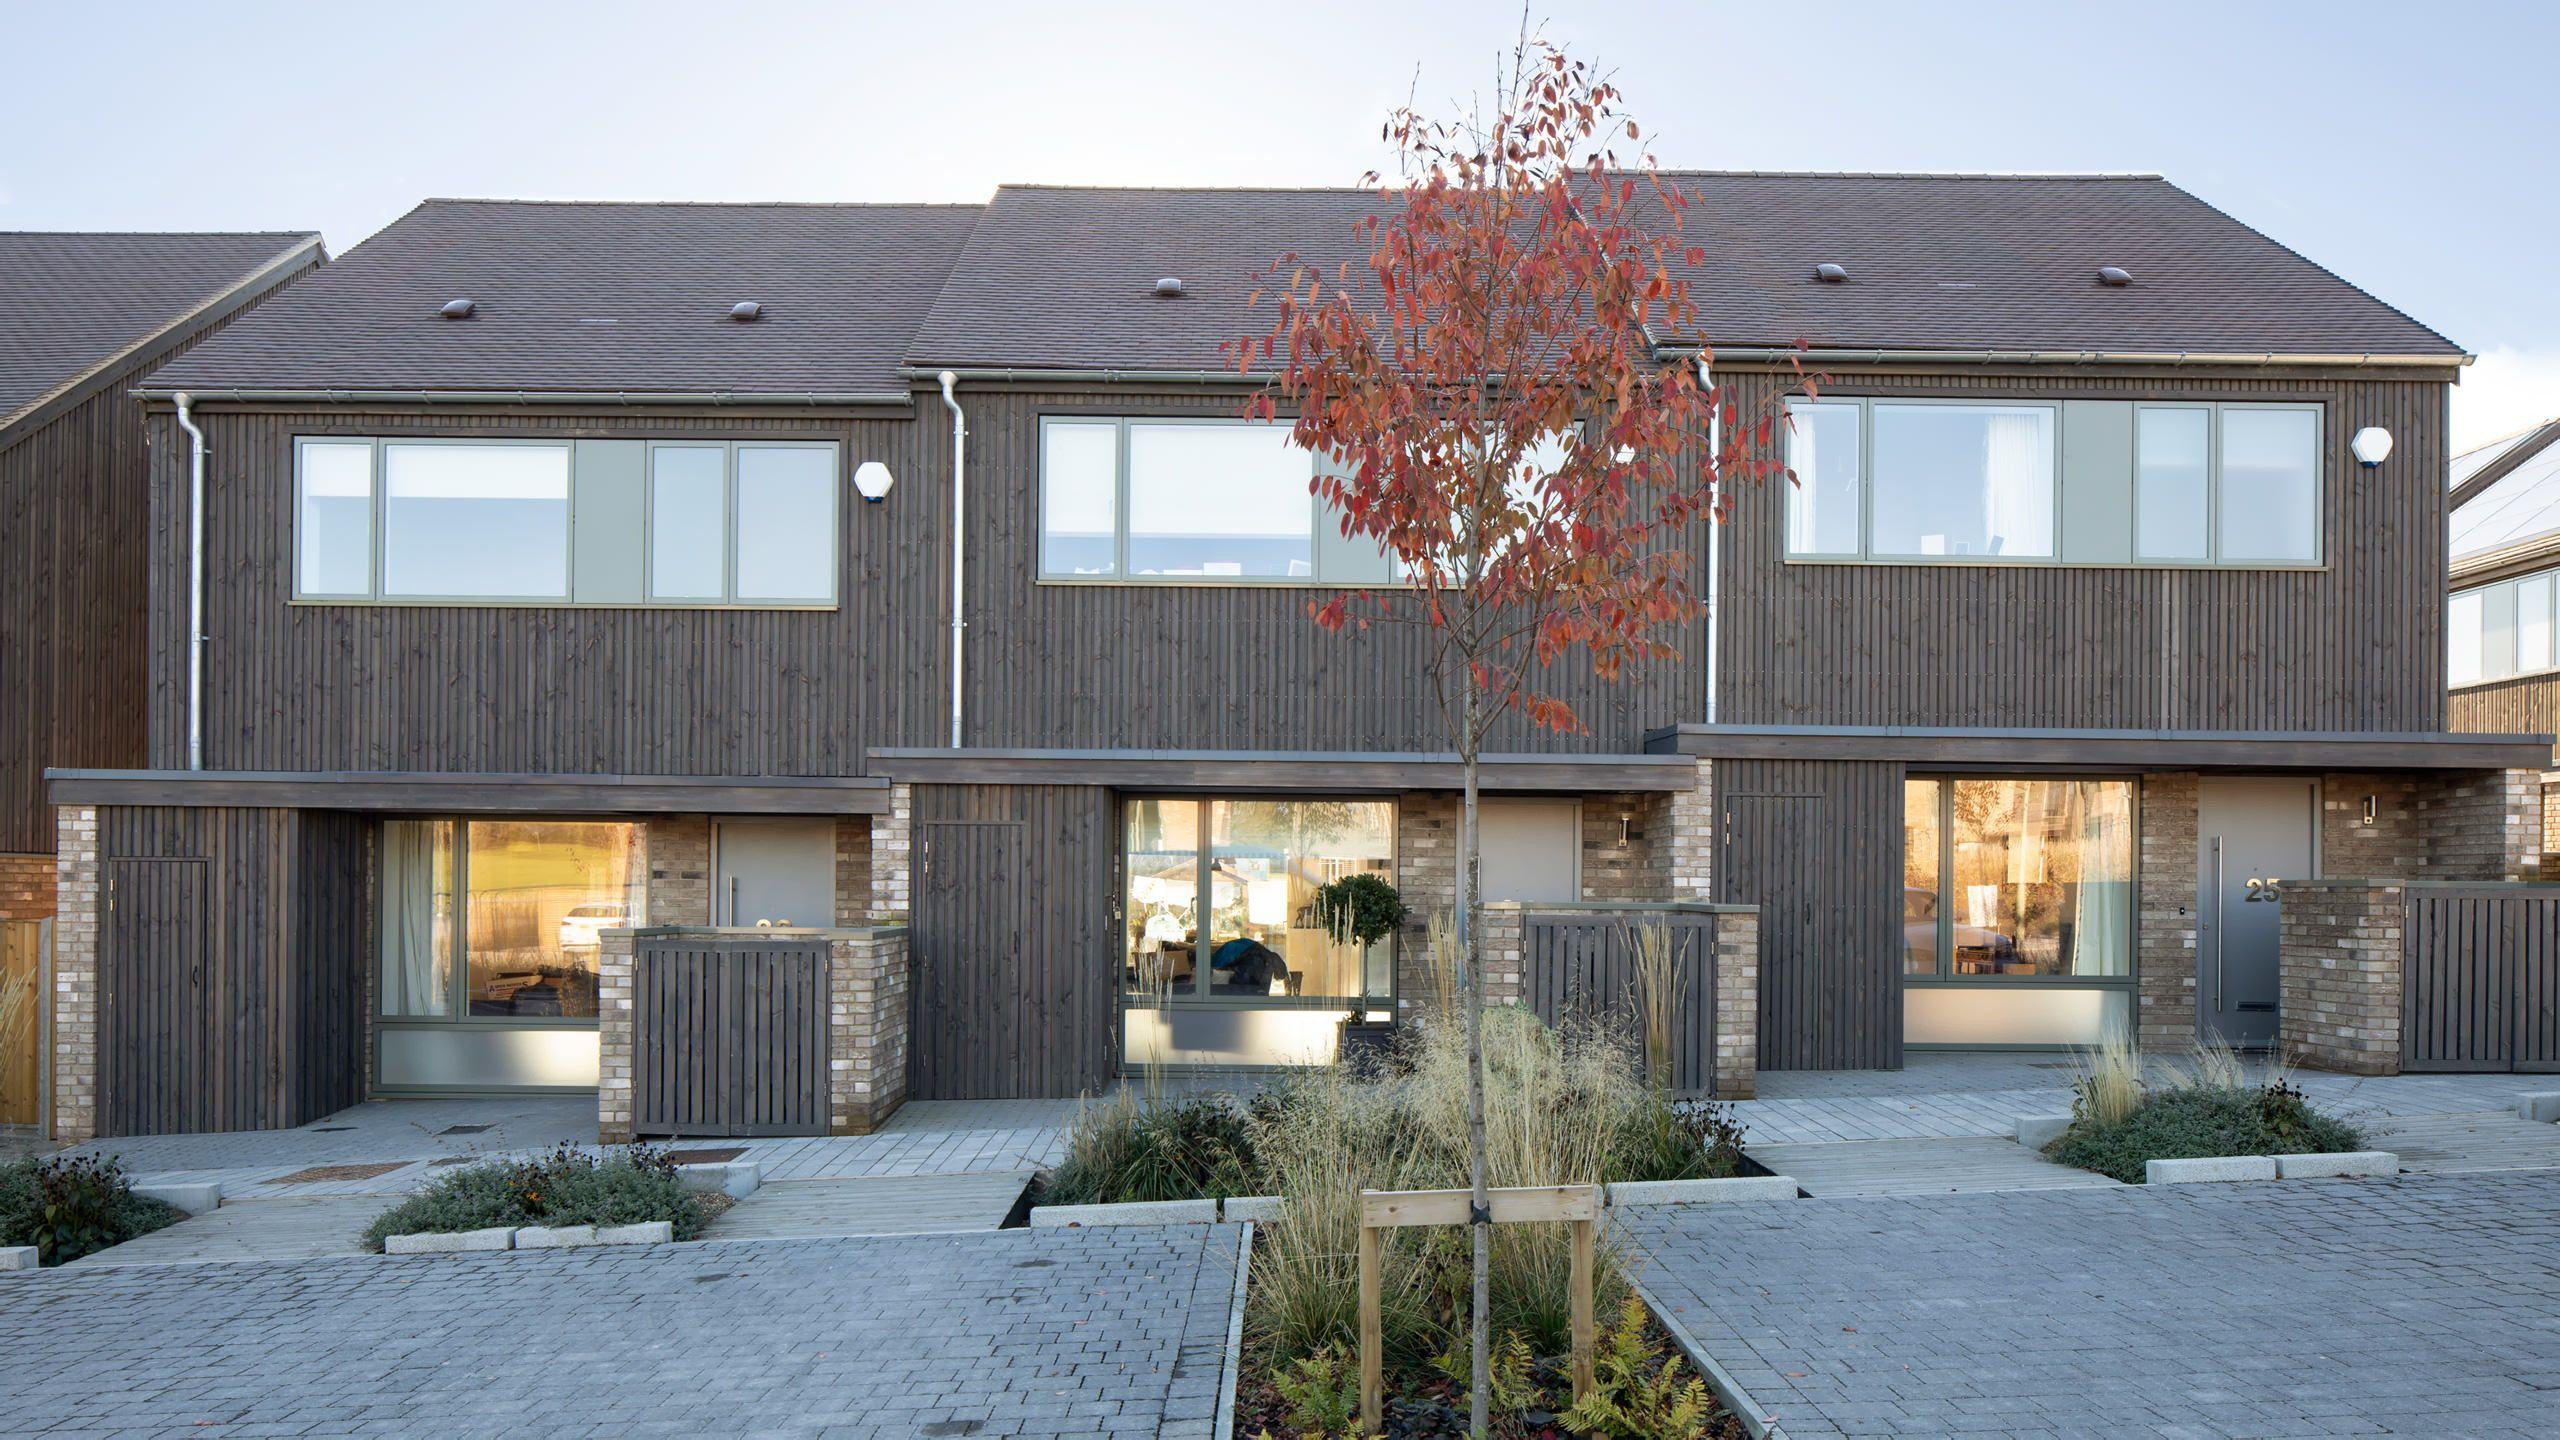 Lovedon Fields Hampshire Uk Residential Architecture Modern